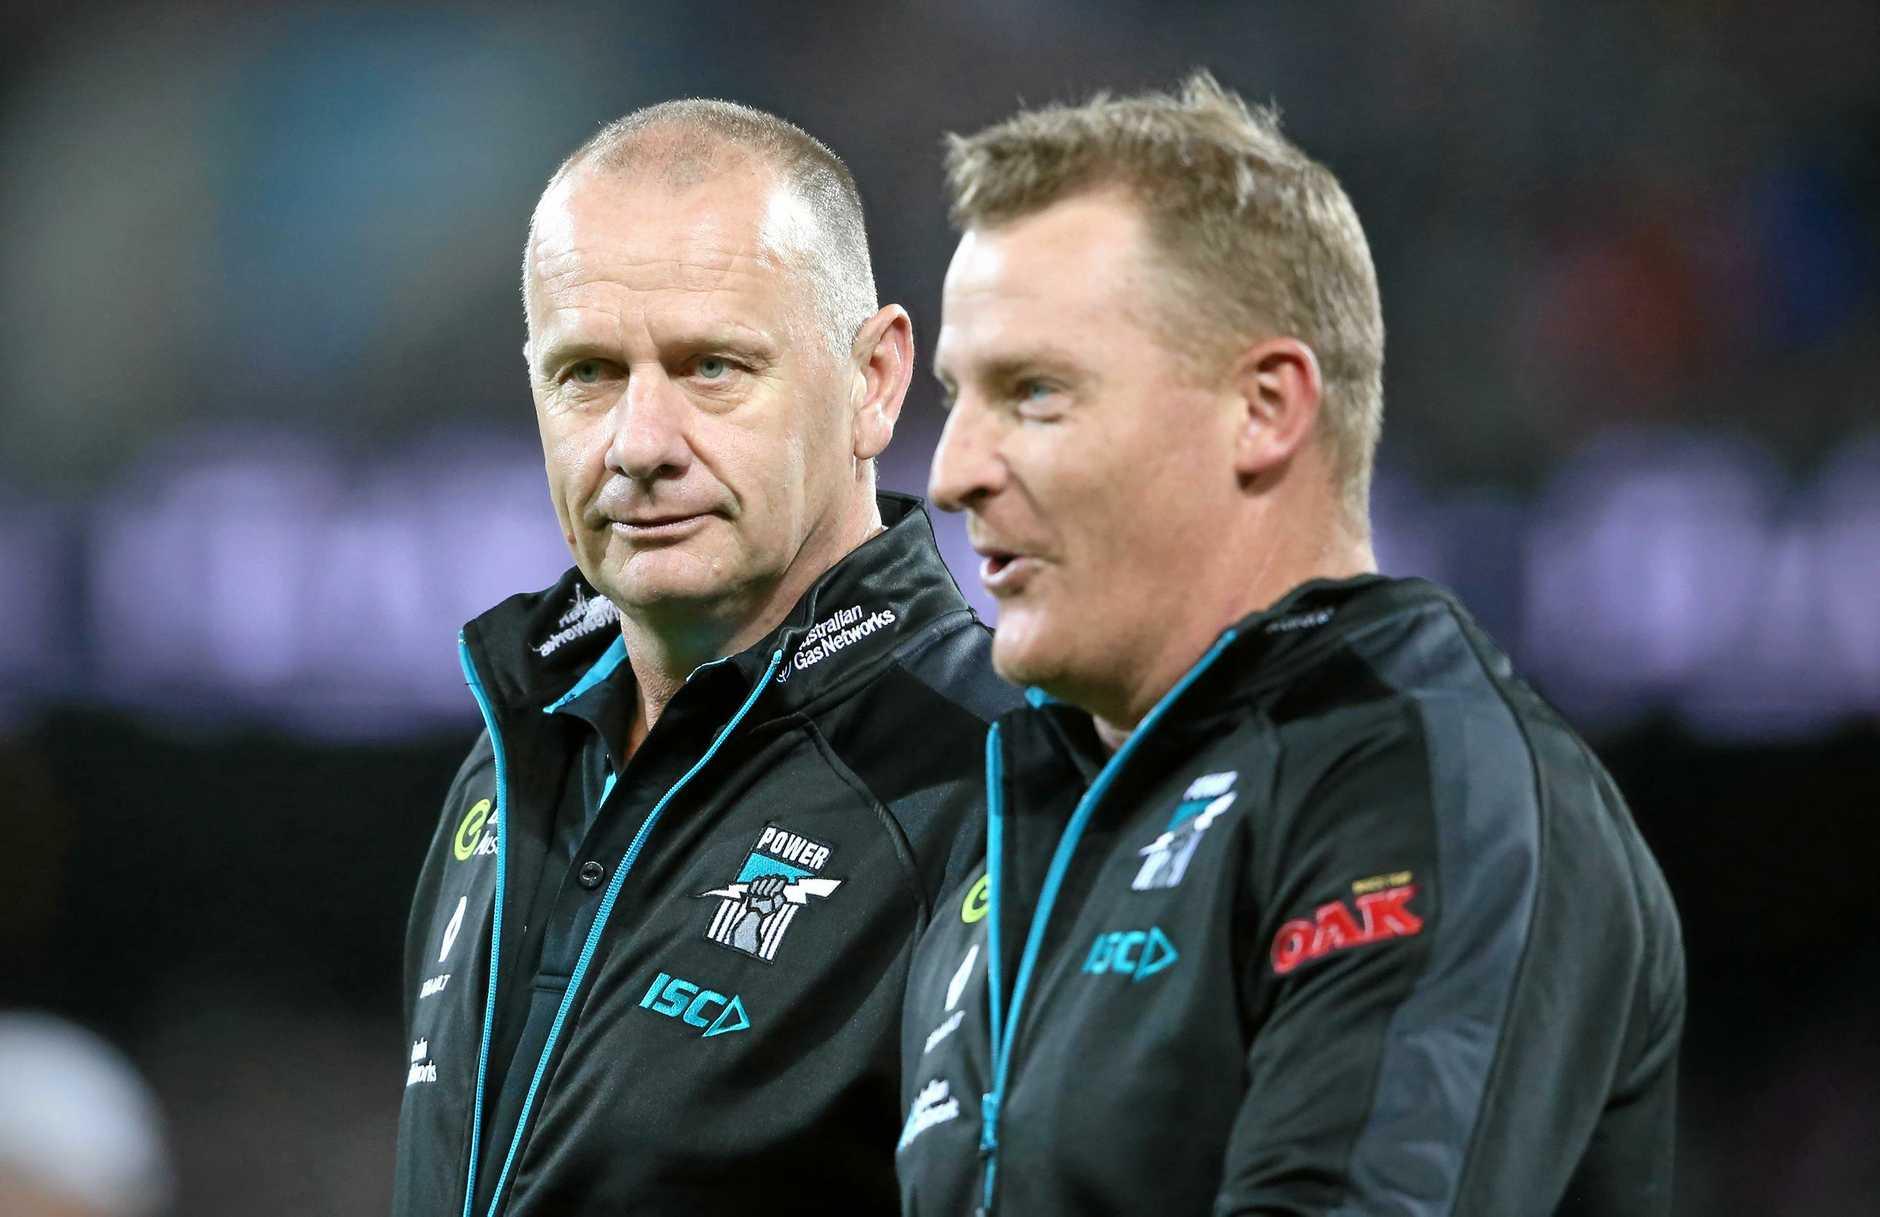 Port Adelaide coach Ken Hinkley (left) talks with assistant coach Michael Voss.